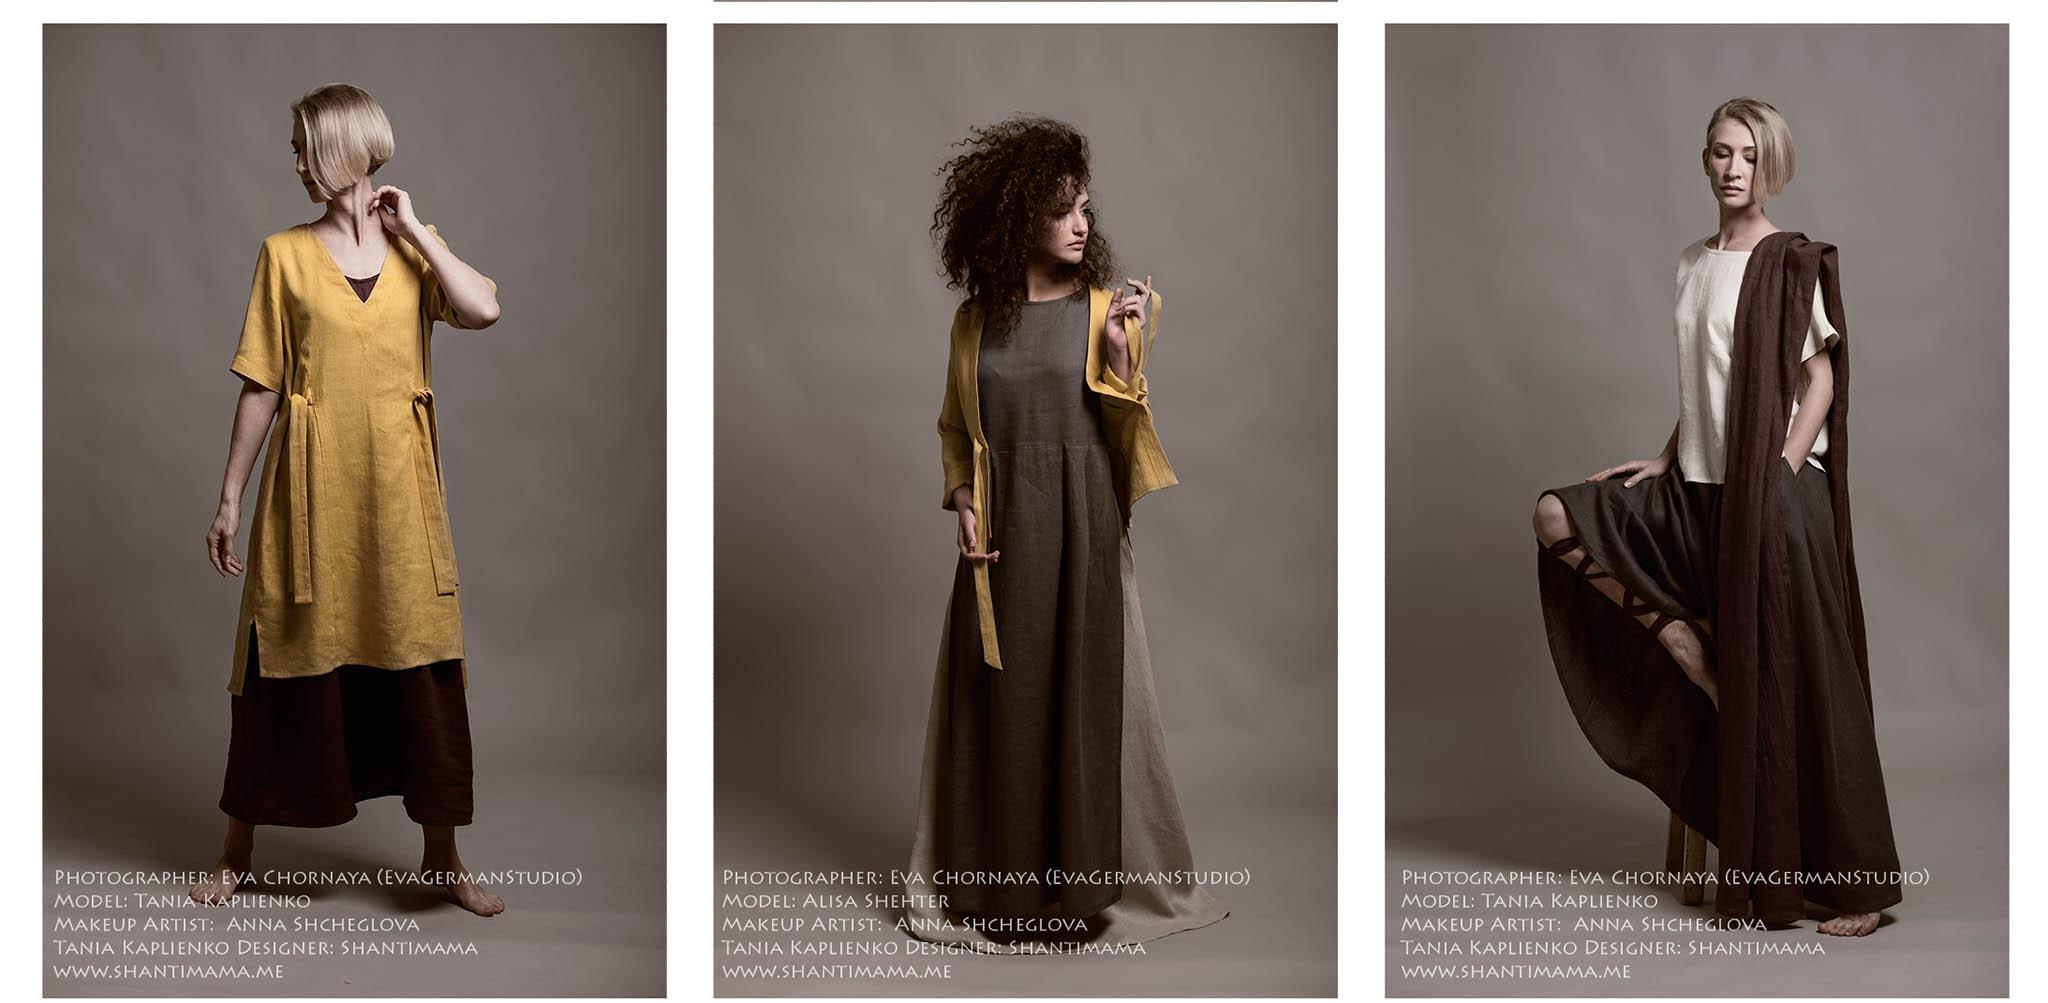 urban folk wear shantimama